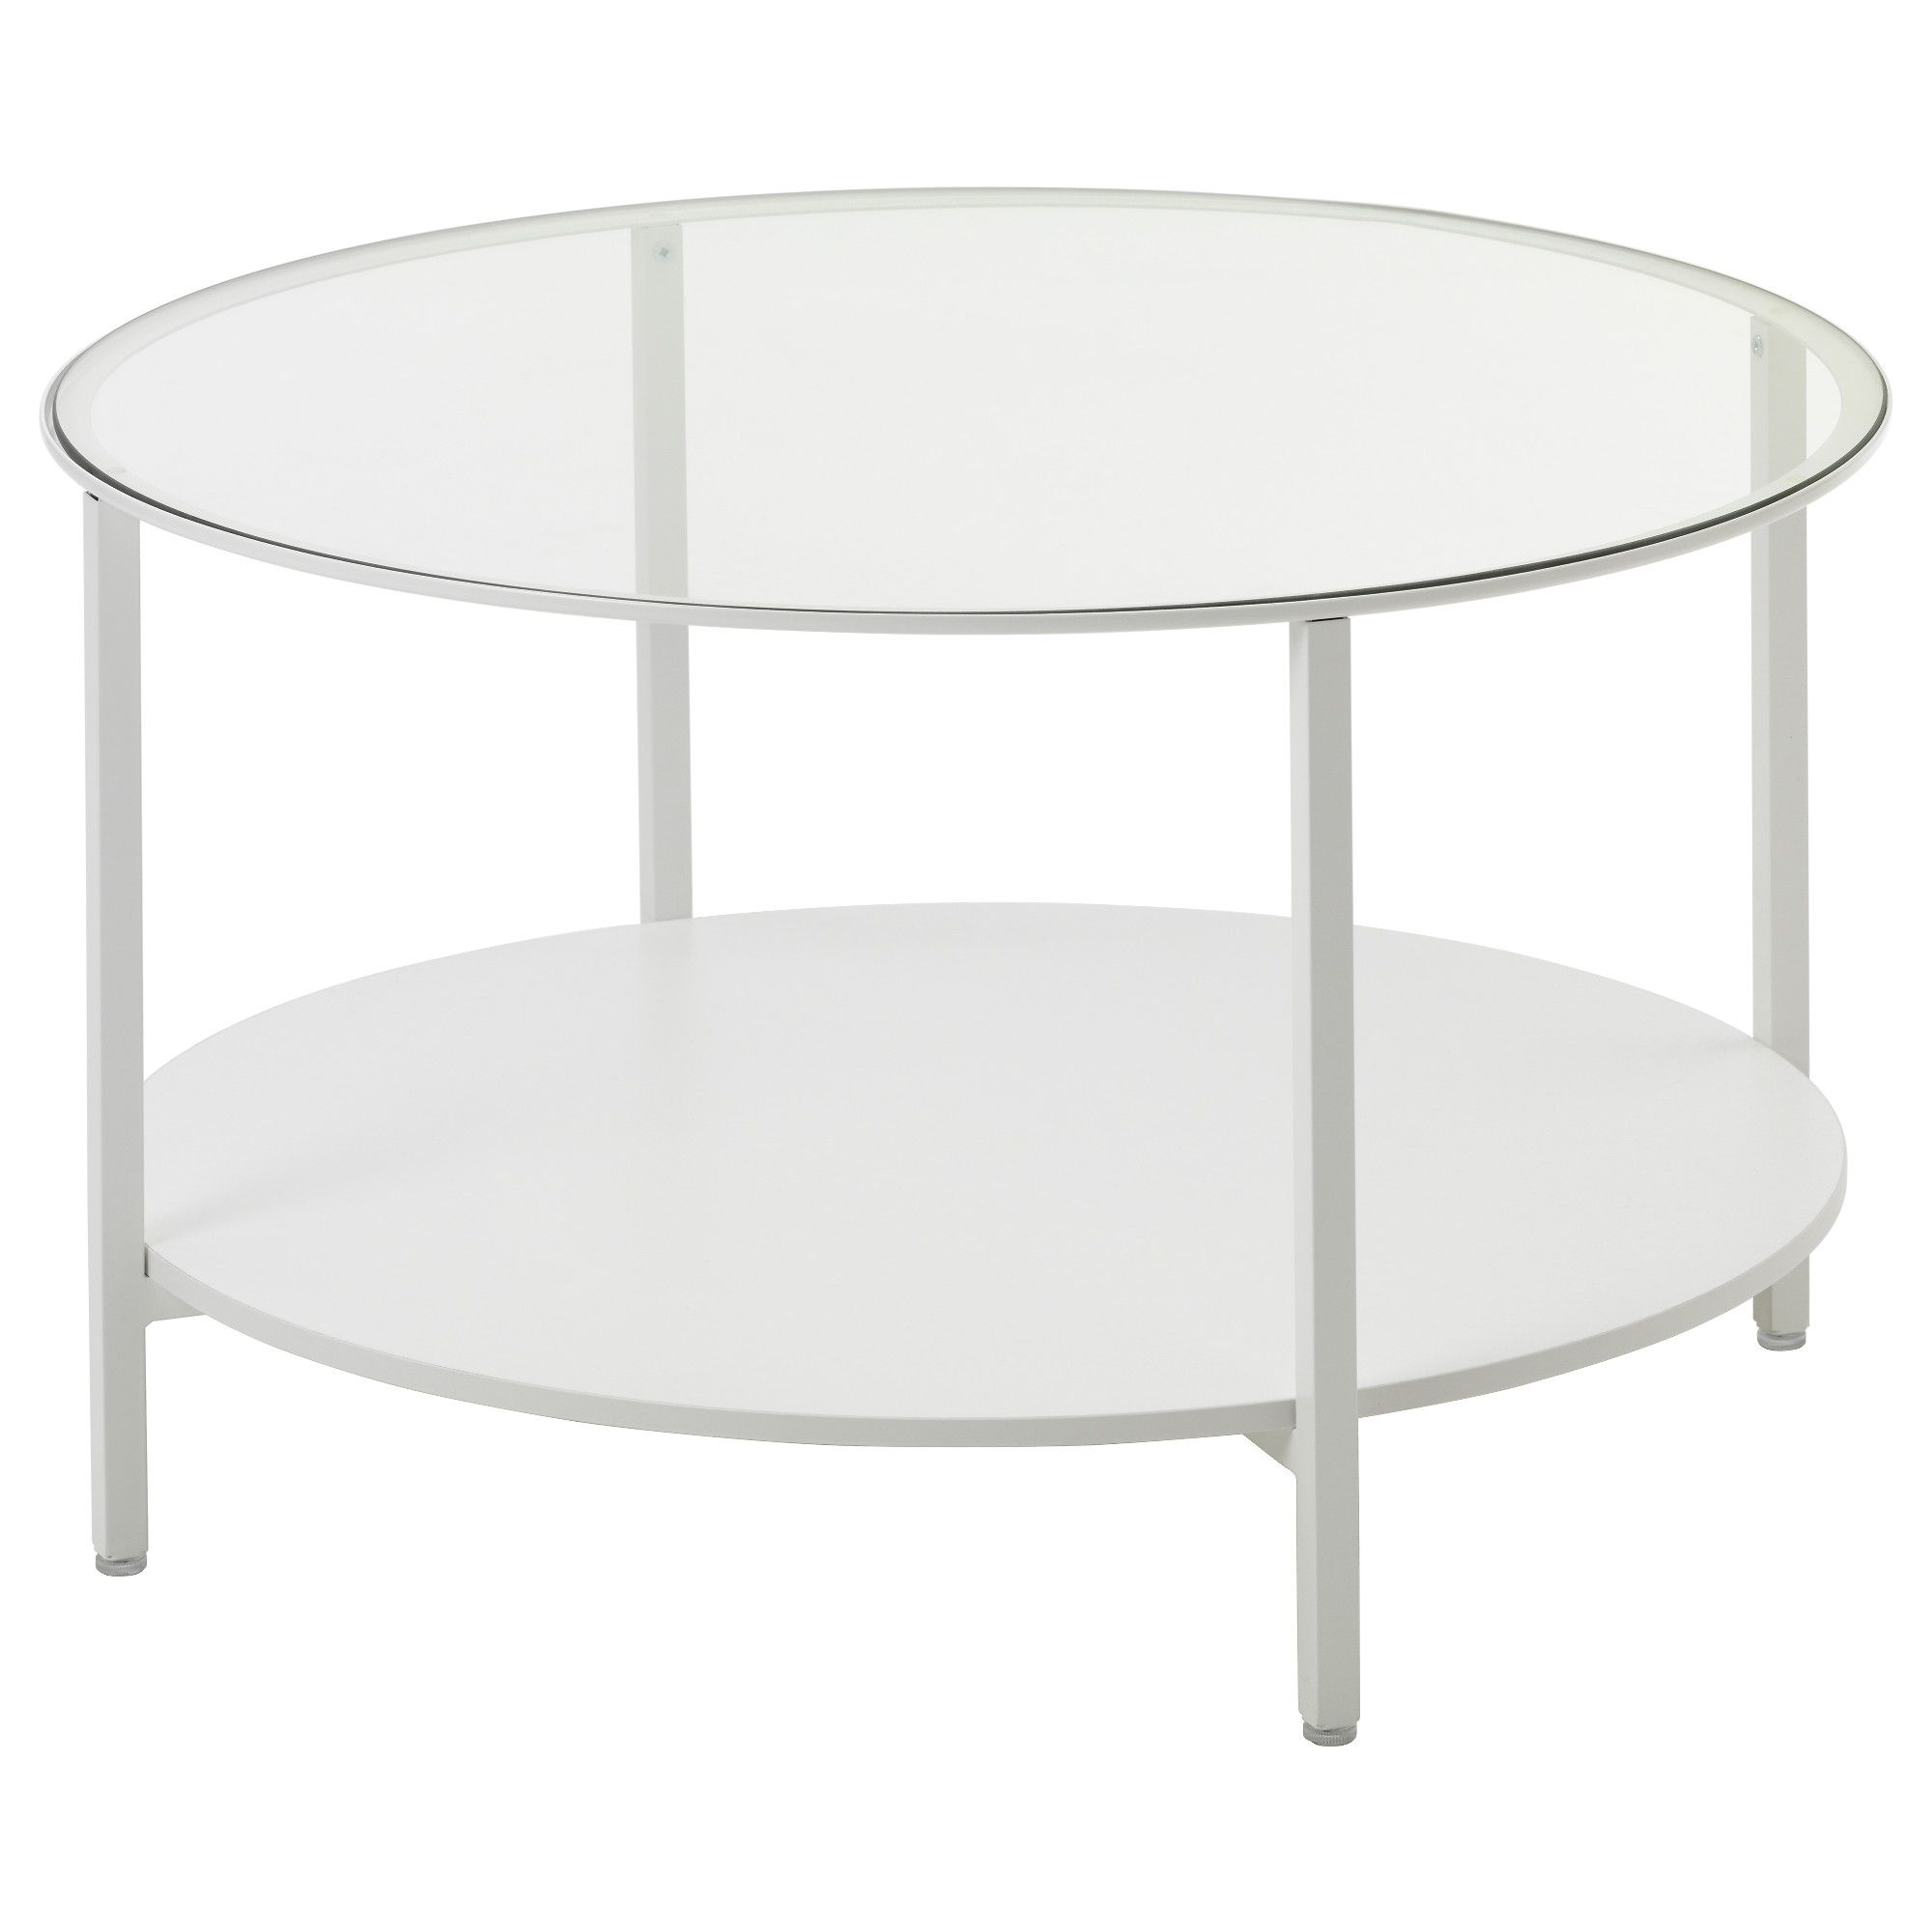 Ikea Us Furniture And Home Furnishings Coffee Table White Ikea Coffee Table Coffee Table